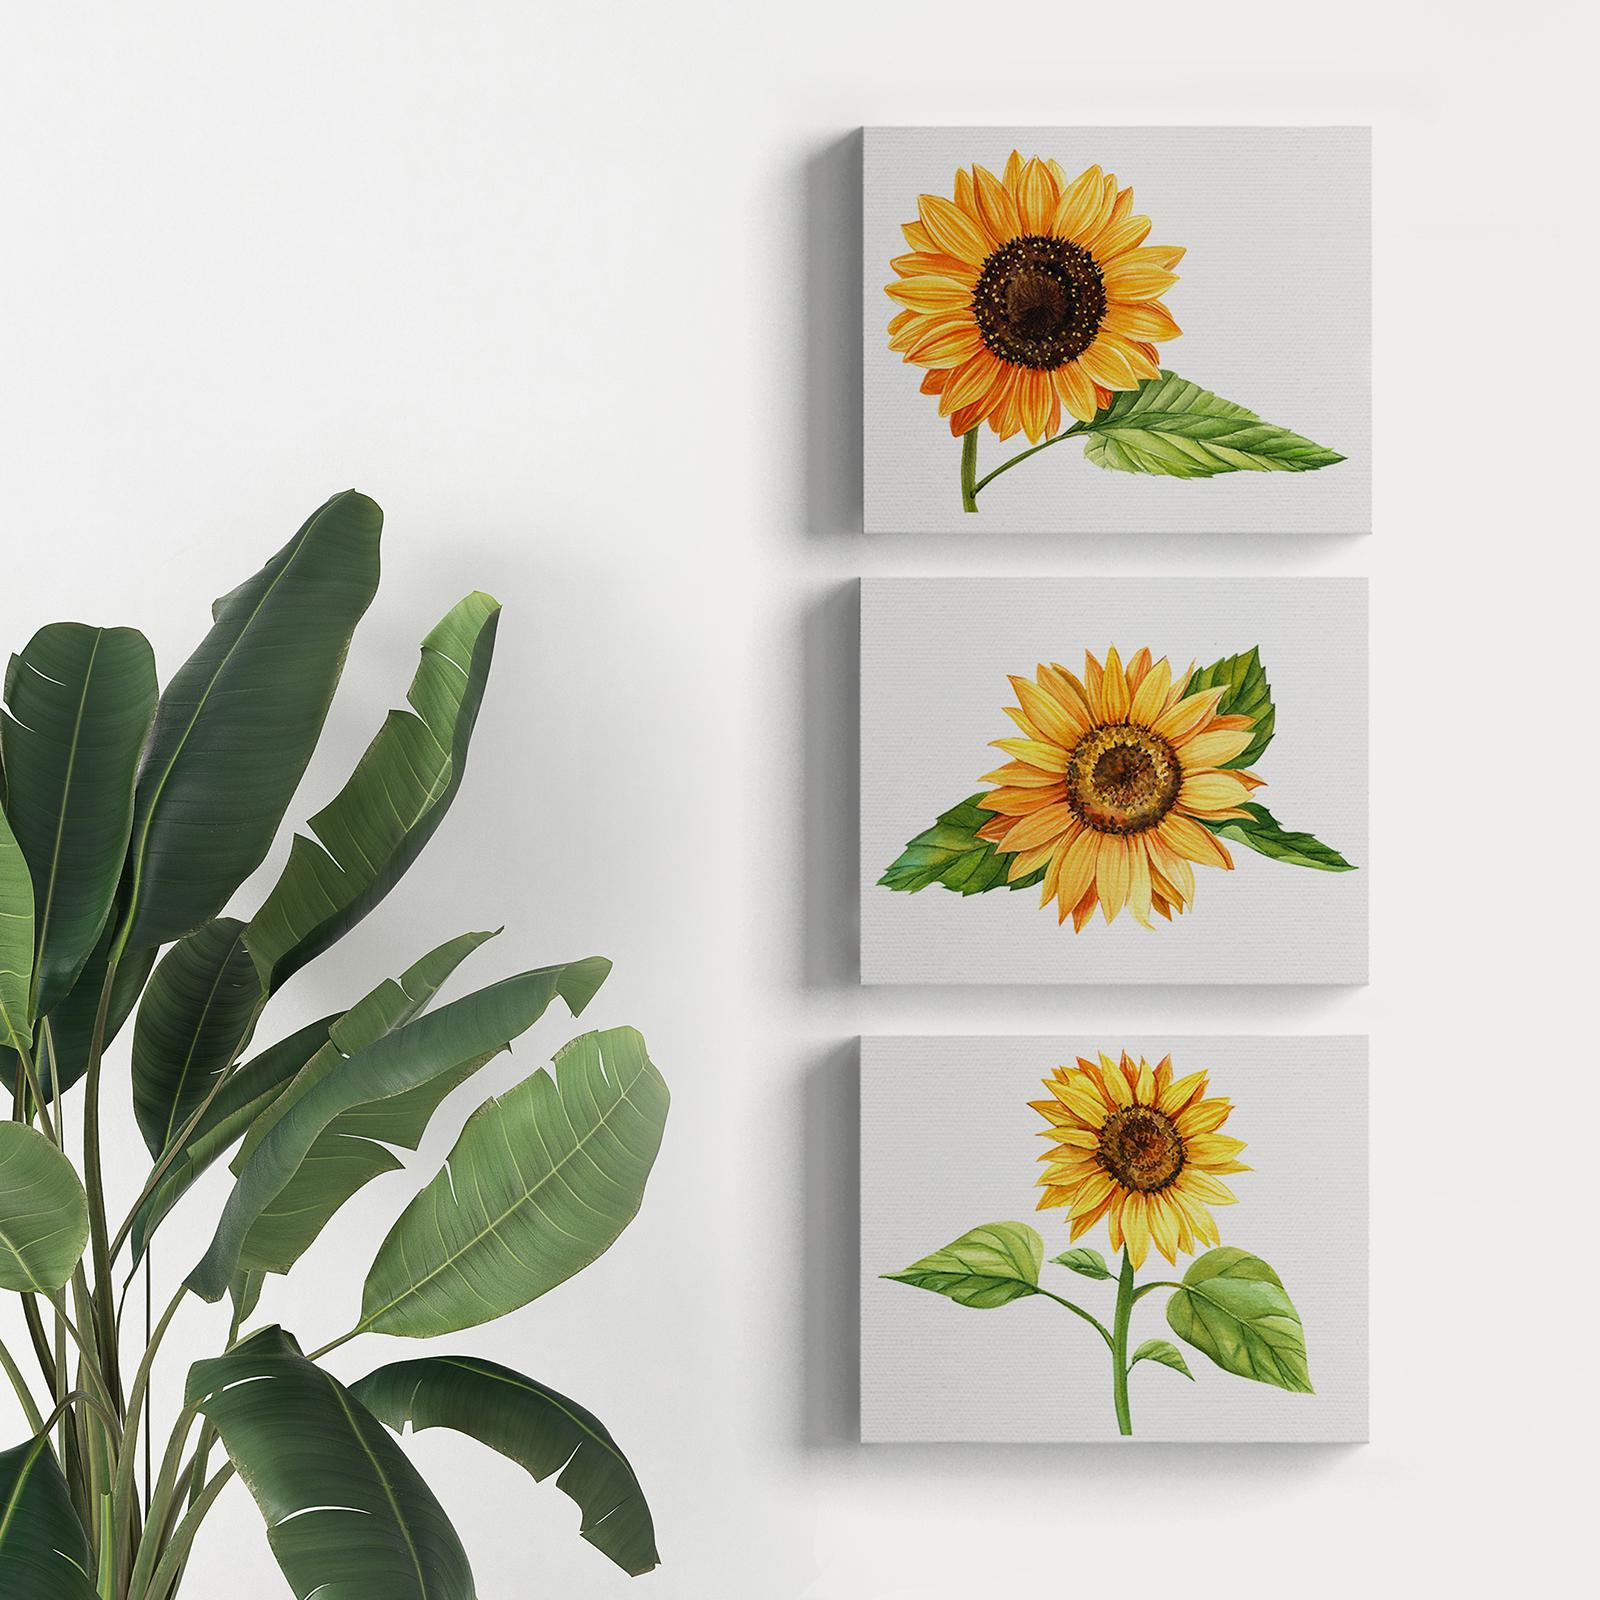 Lukisan Dekorasi Sunflower Poster Kanvas Hiasan Dinding Bunga Matahari 20x25cm Lazada Indonesia